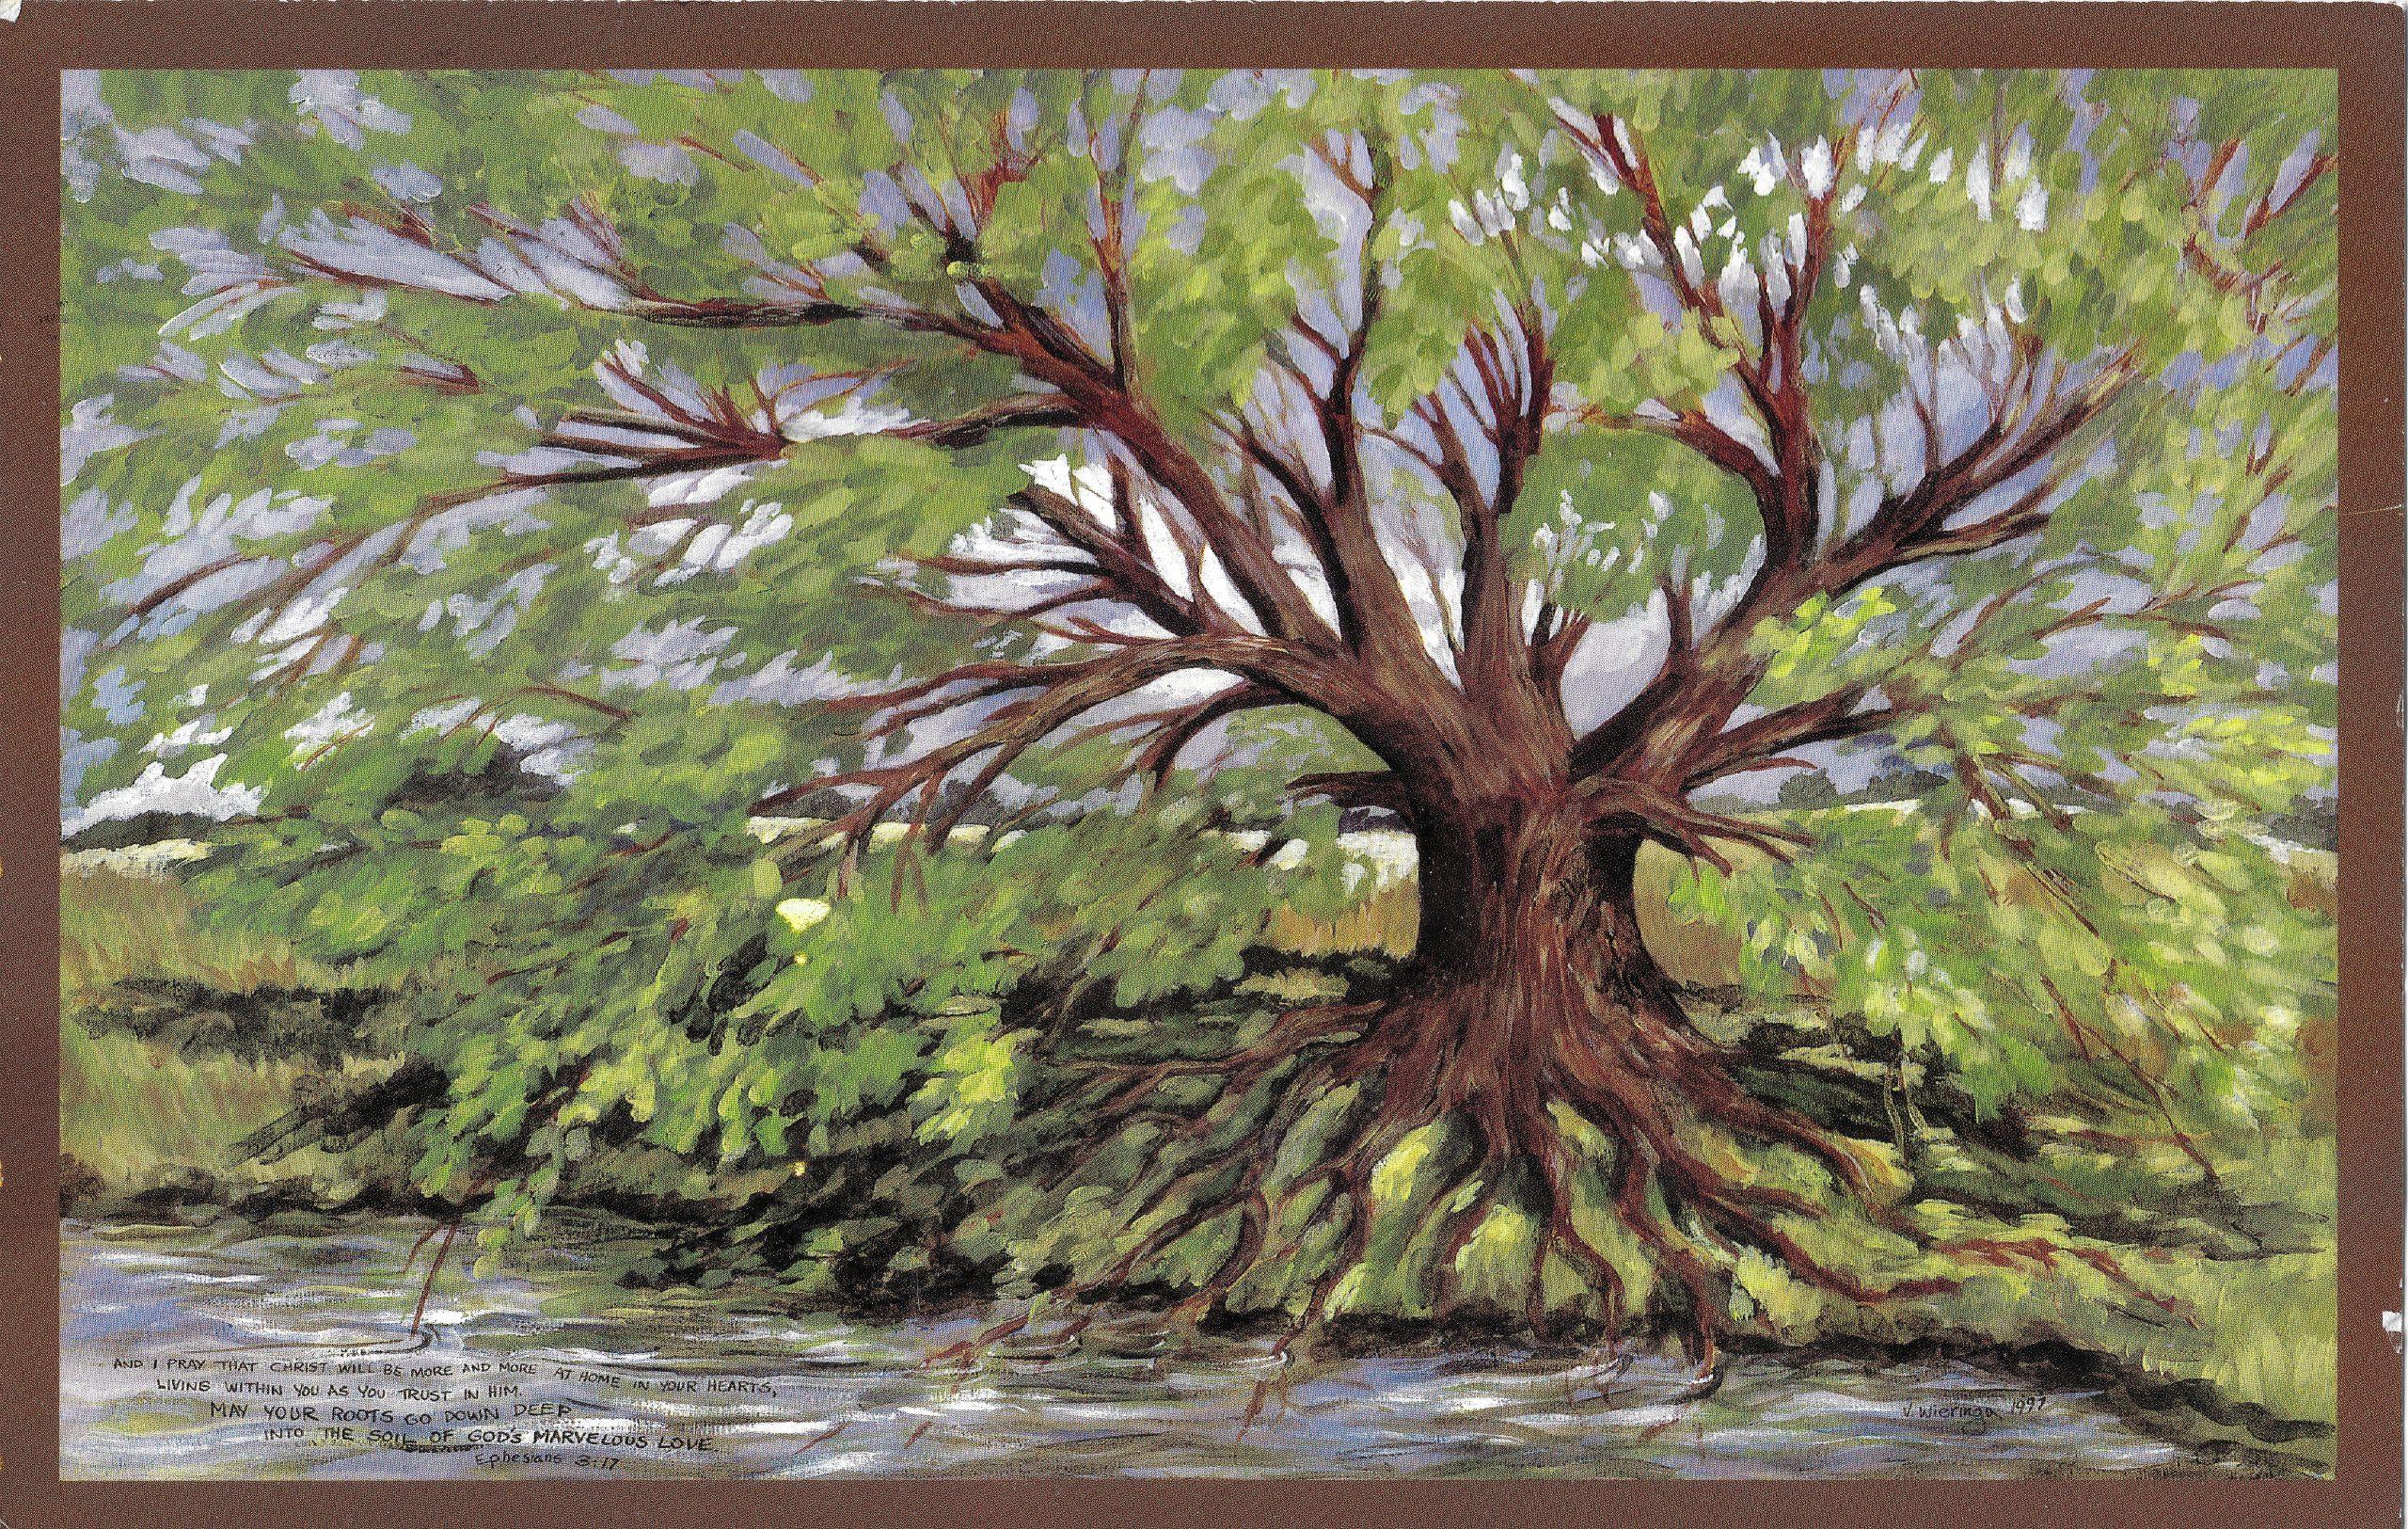 No One Will Make Them Afraid: The Arborist's Bible